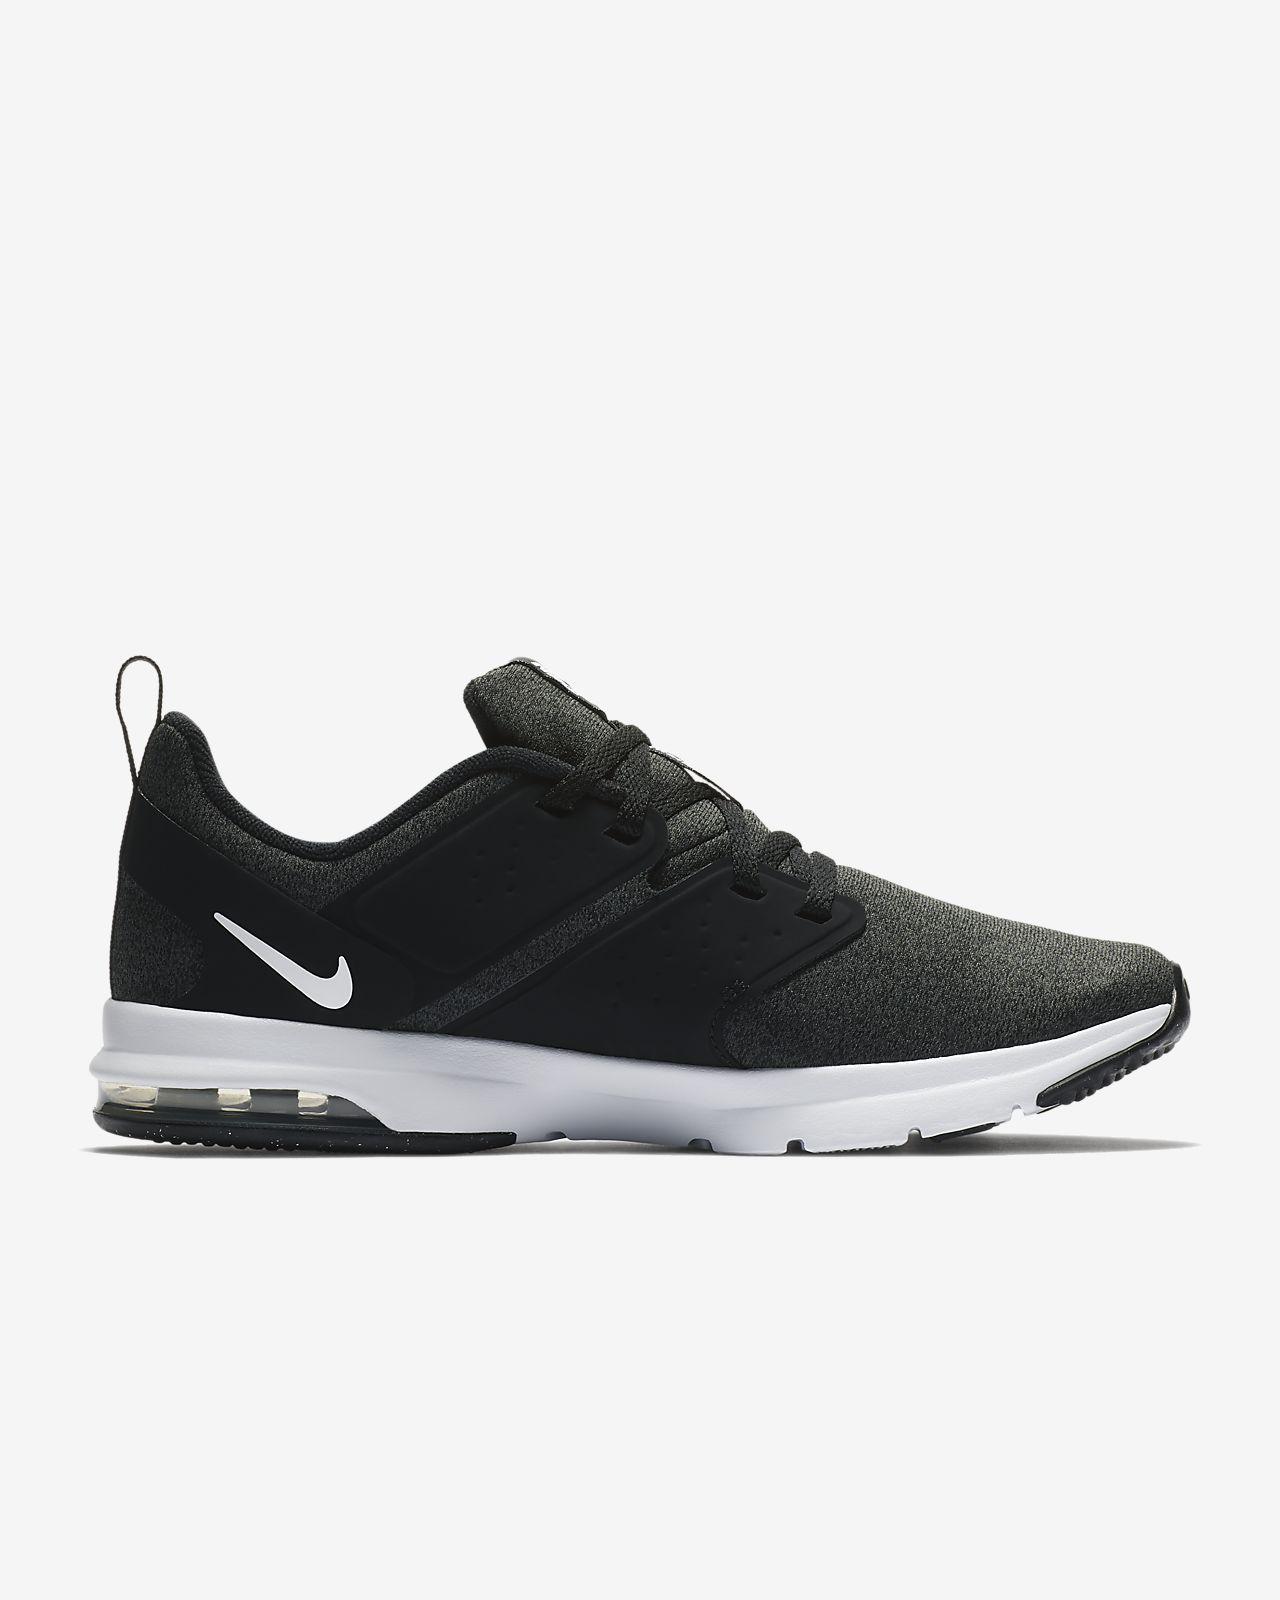 2ccf3a000f8 Nike Air Bella TR Femme E2j6F - nitrate.jemuti.fr